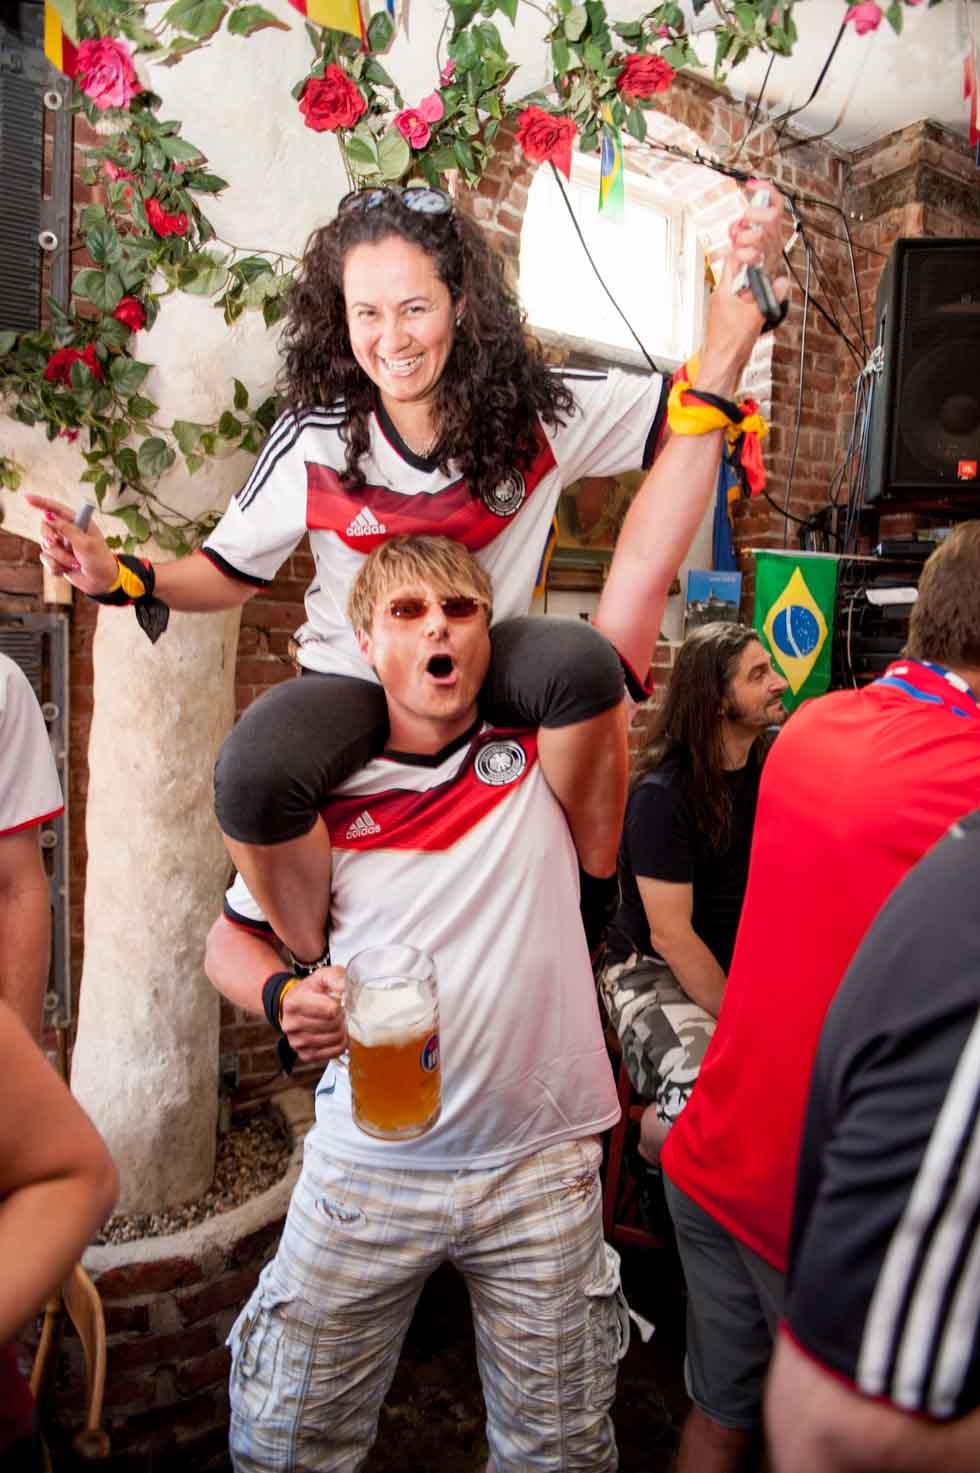 zum-schneider-nyc-2014-germany-portugal-world-cup-7807.jpg